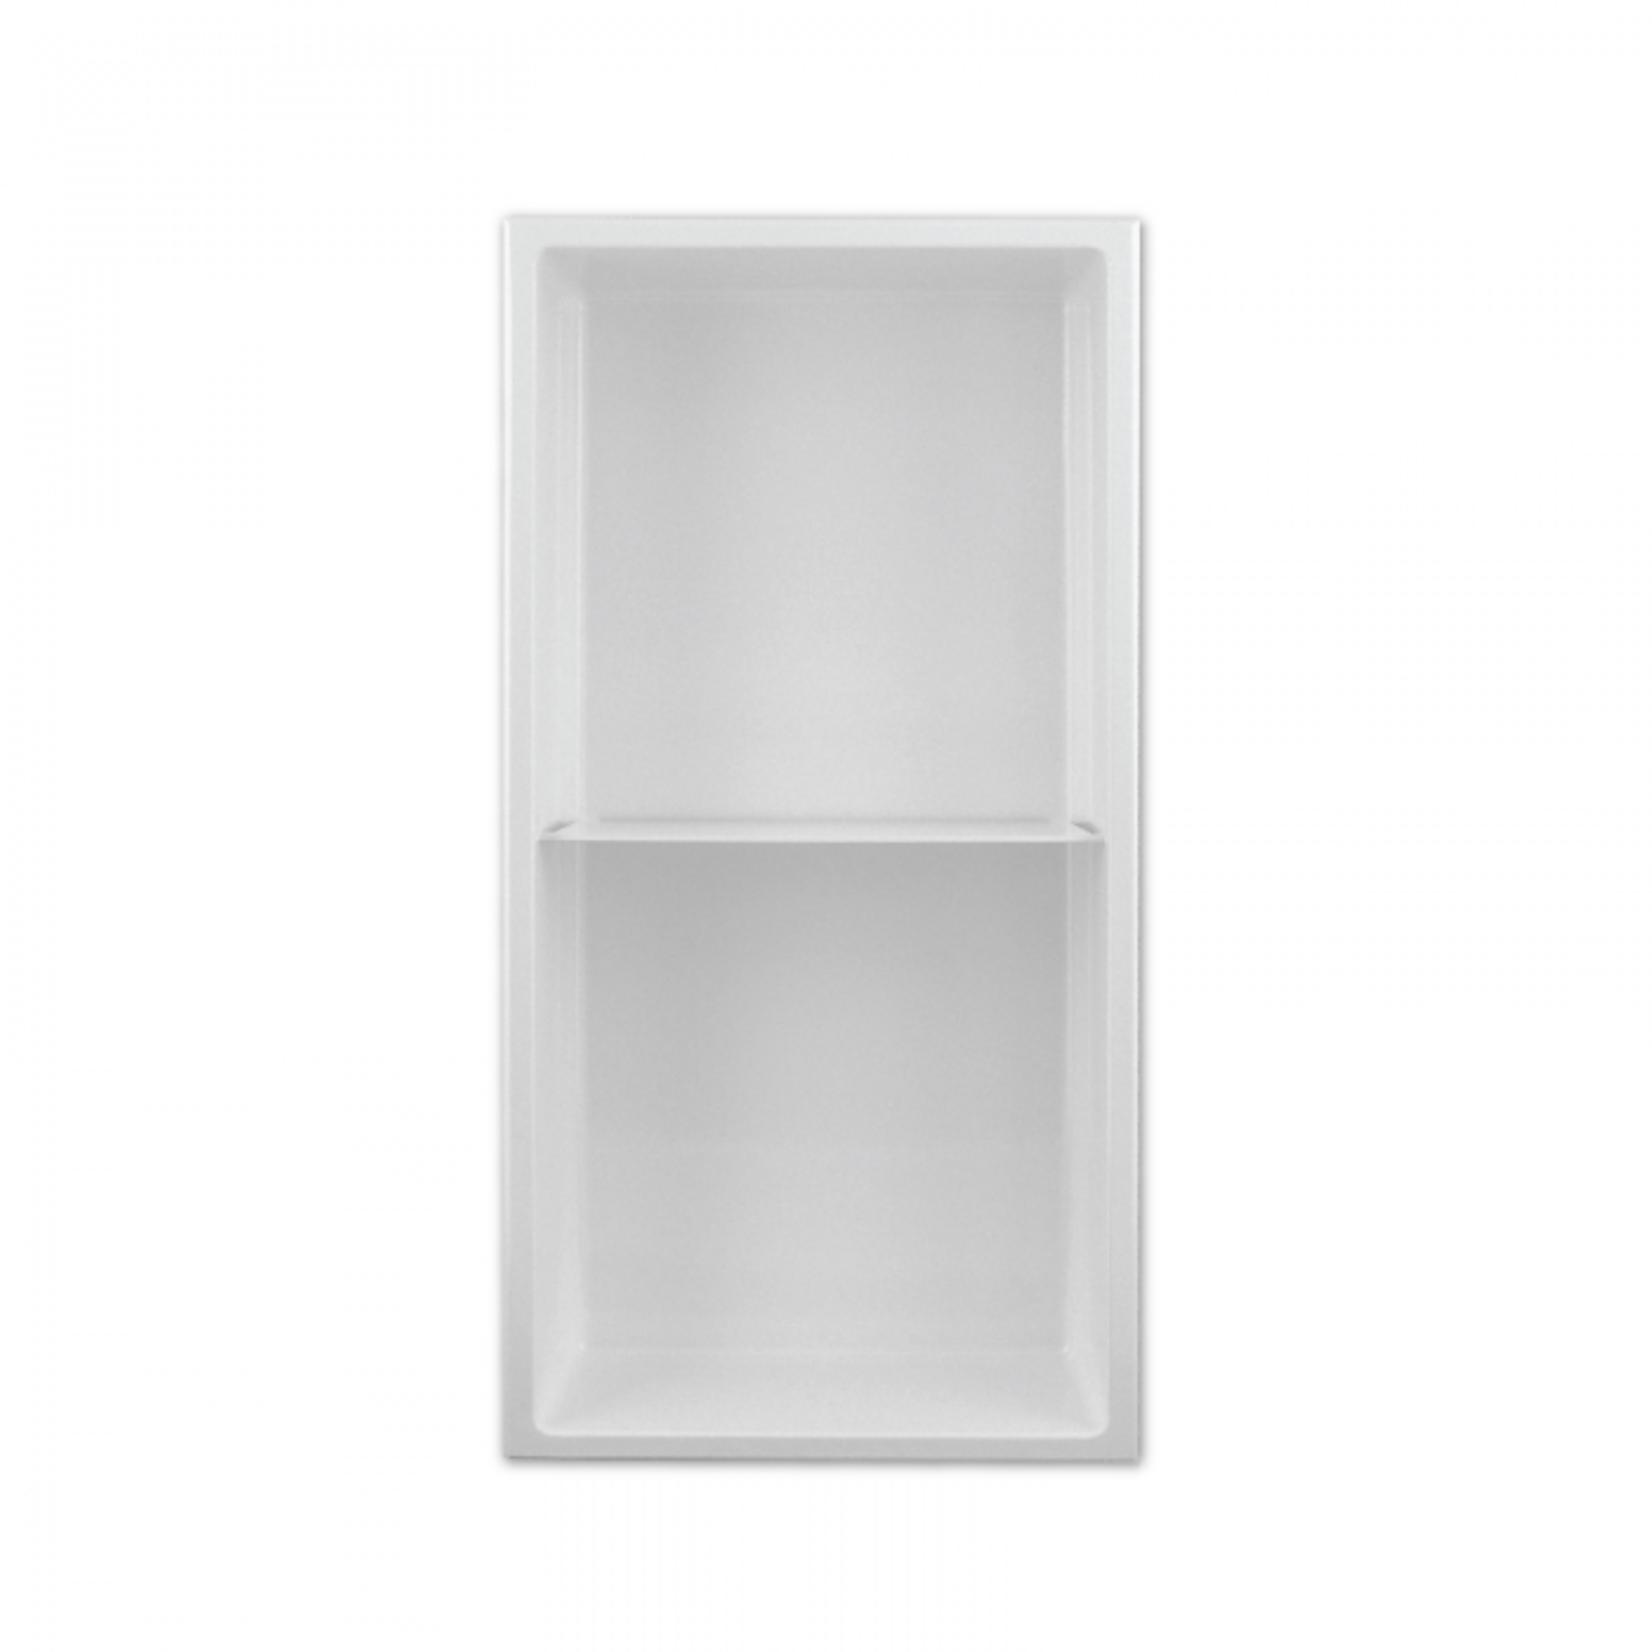 Wall niche with shelf 24x12 White Nautika NI2412TW